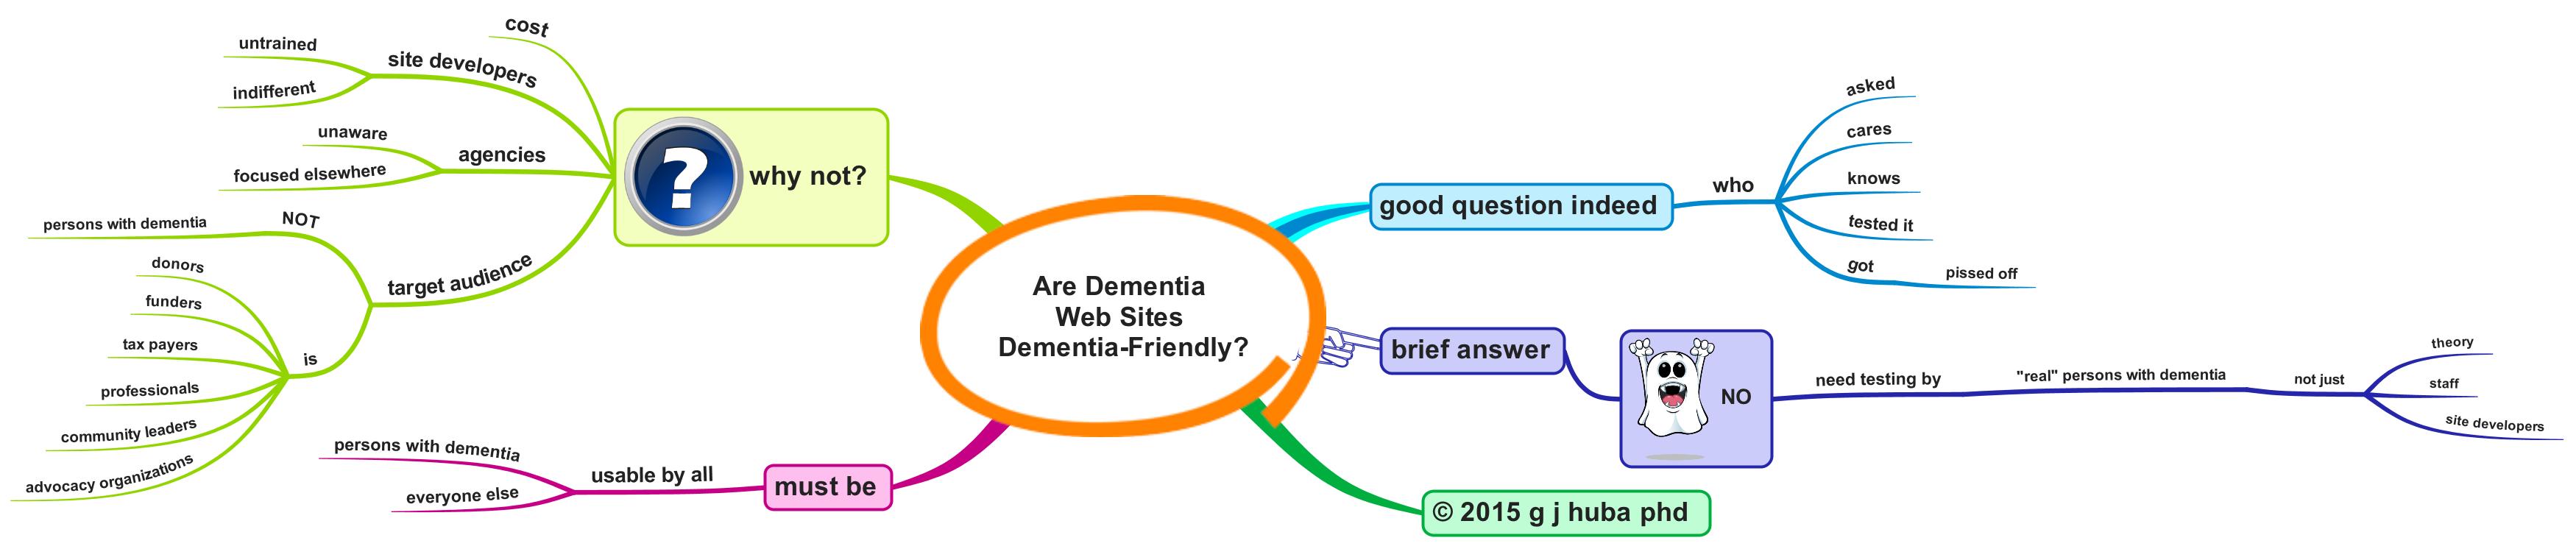 Are Dementia Web Sites Dementia-Friendly